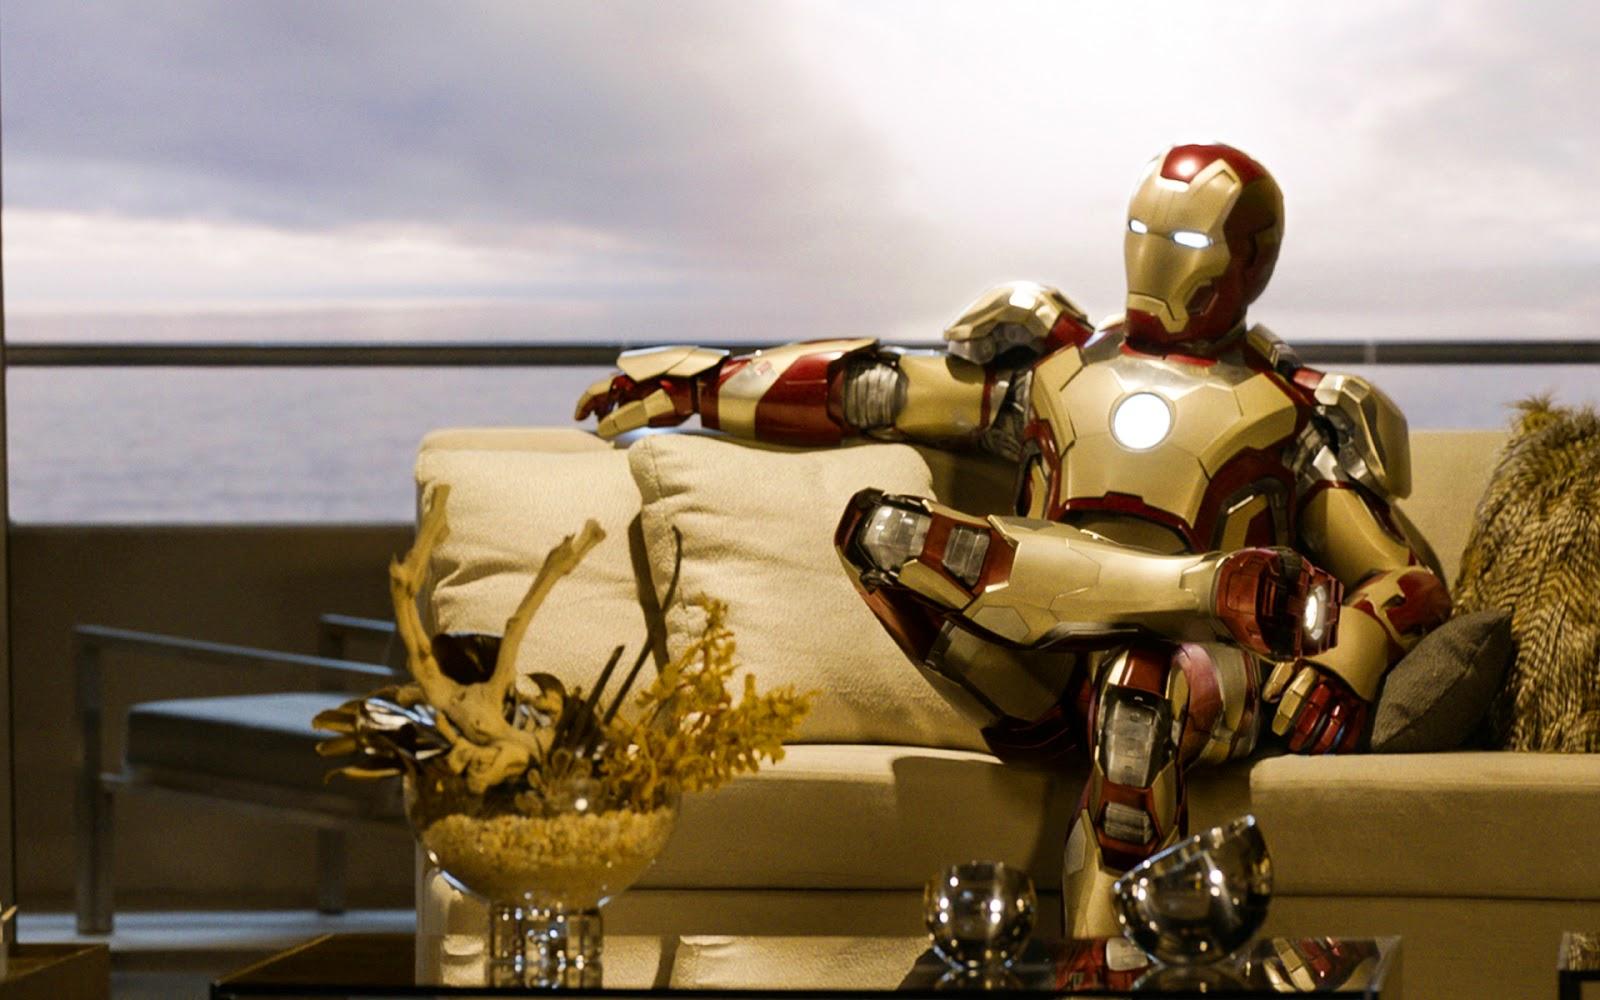 iron man 3 movie wallpapers iron man 3 movie wallpapers iron man 3 1600x1000